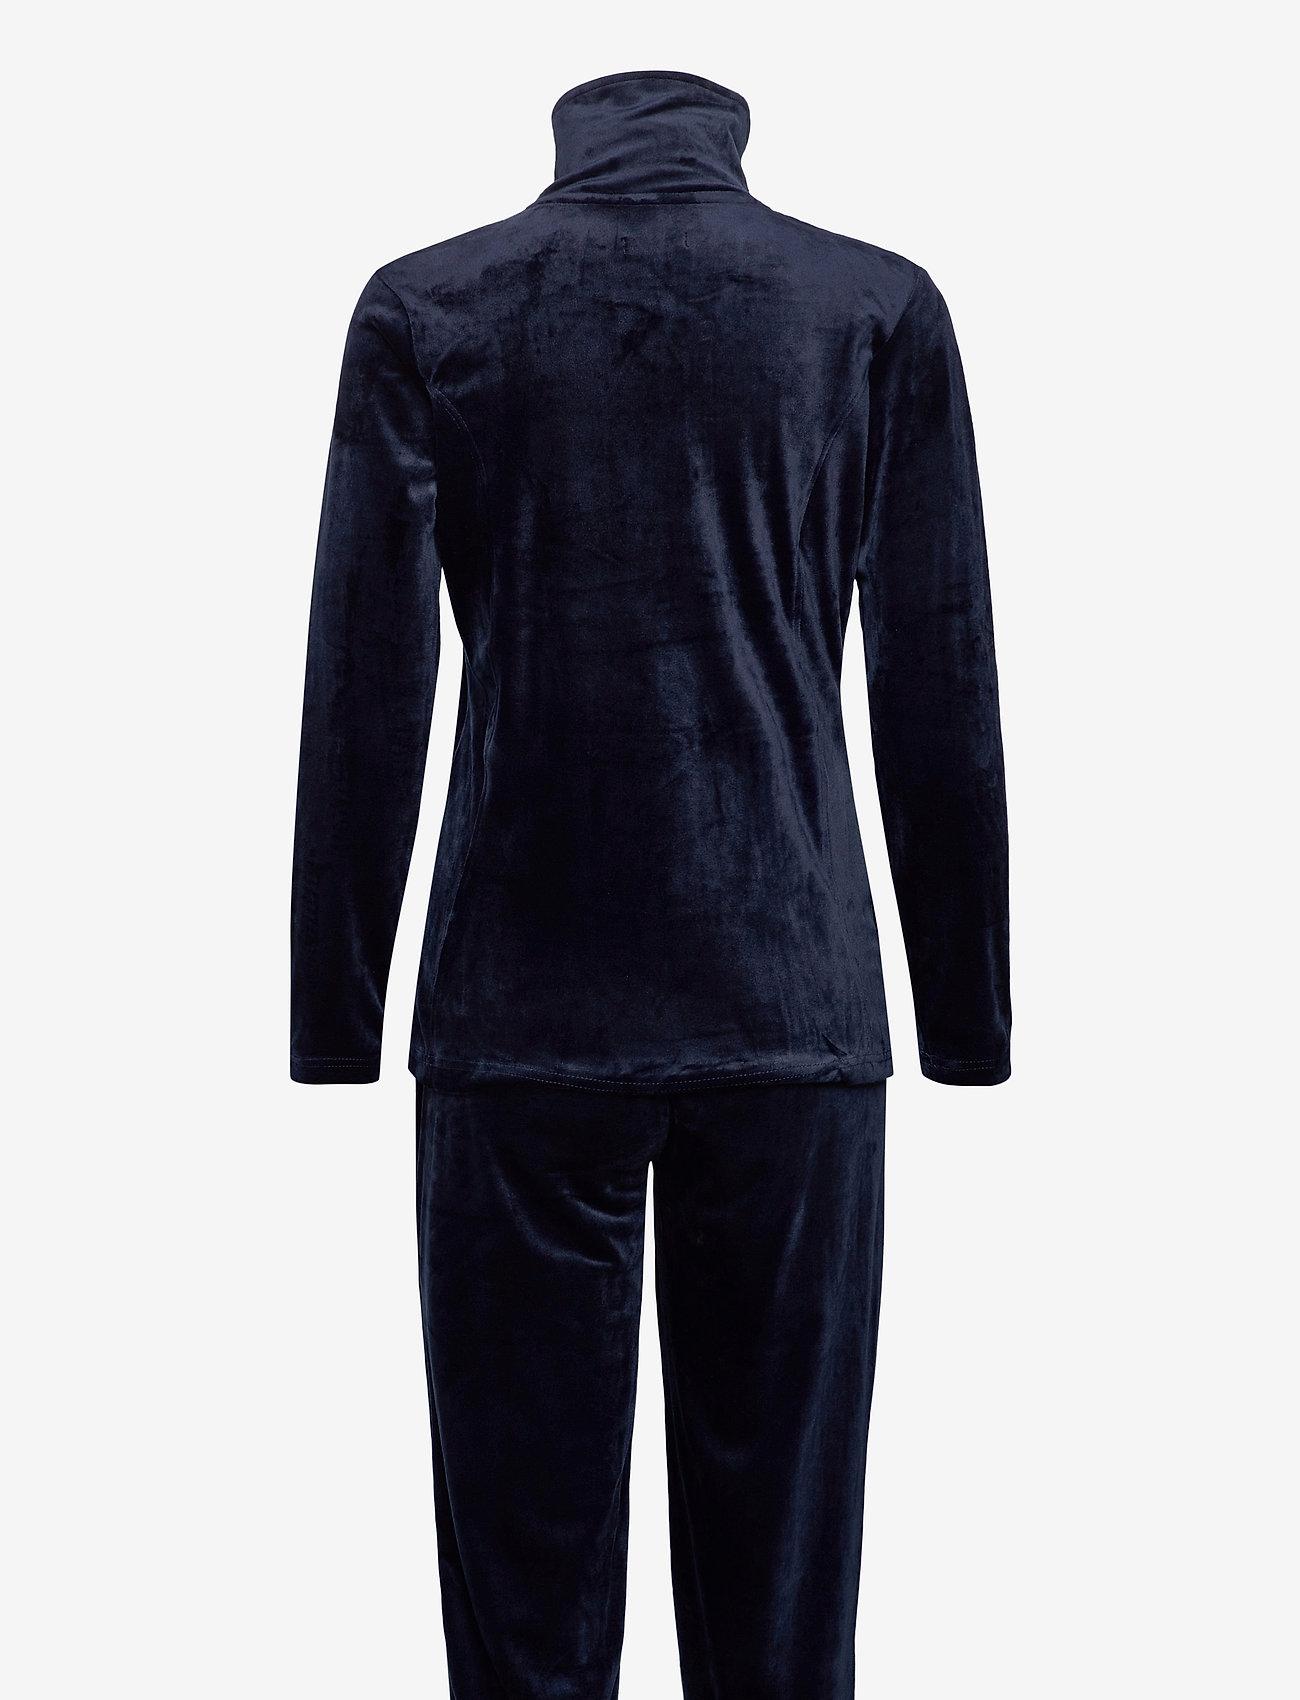 Decoy - DECOY velour homewear set - pyjama''s - no color name - 1